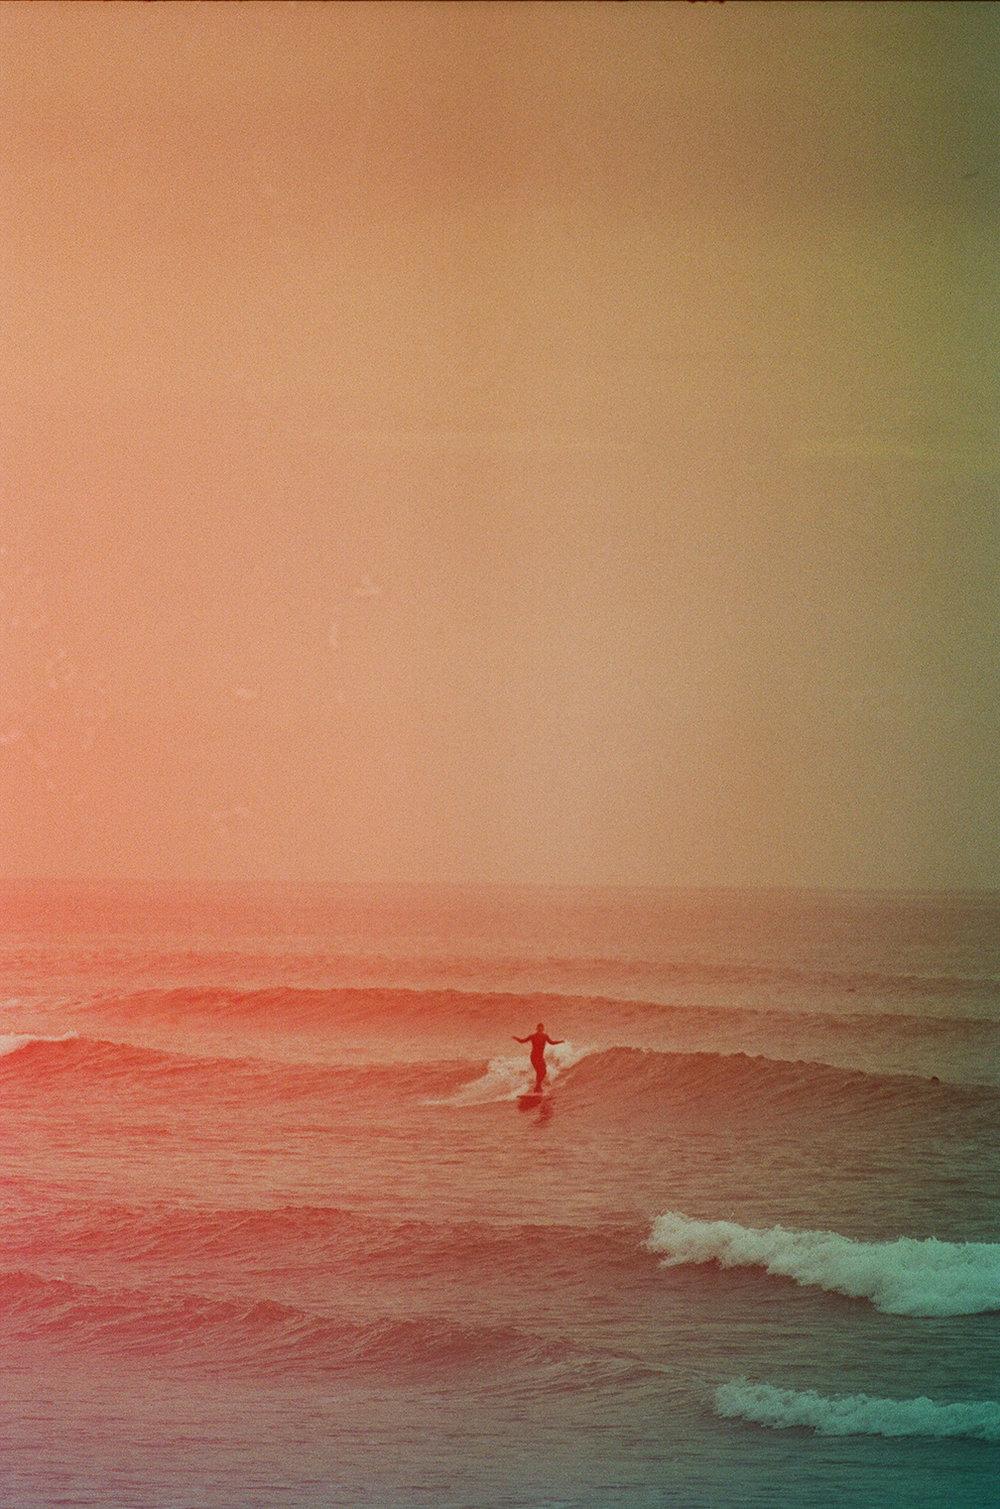 San O solo surfer_0029.jpg